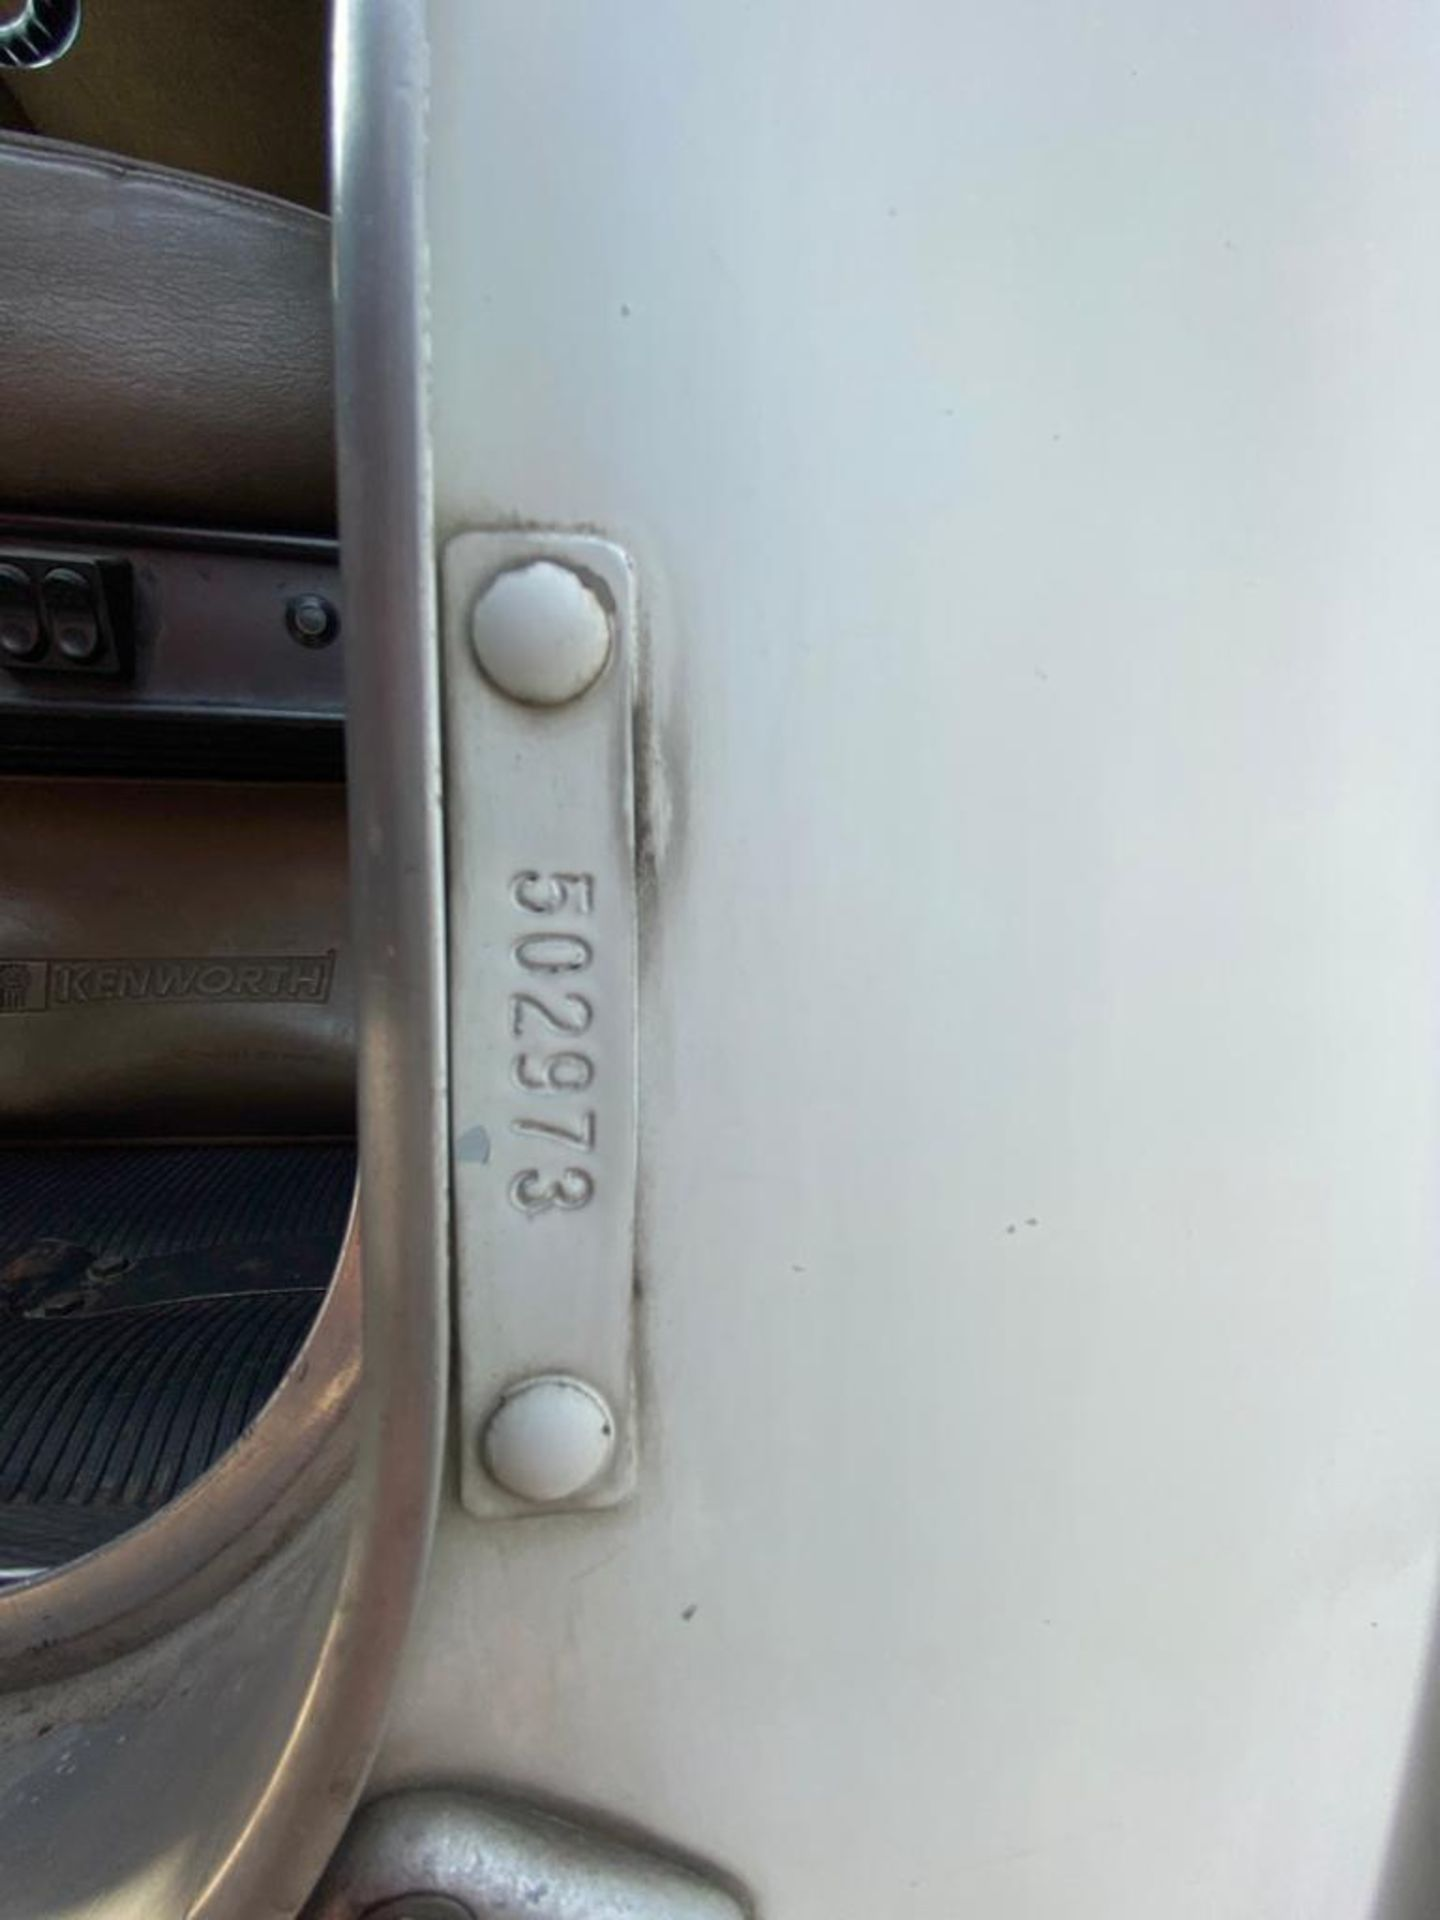 1999 Kenworth Sleeper truck tractor, standard transmission of 18 speeds - Image 49 of 72